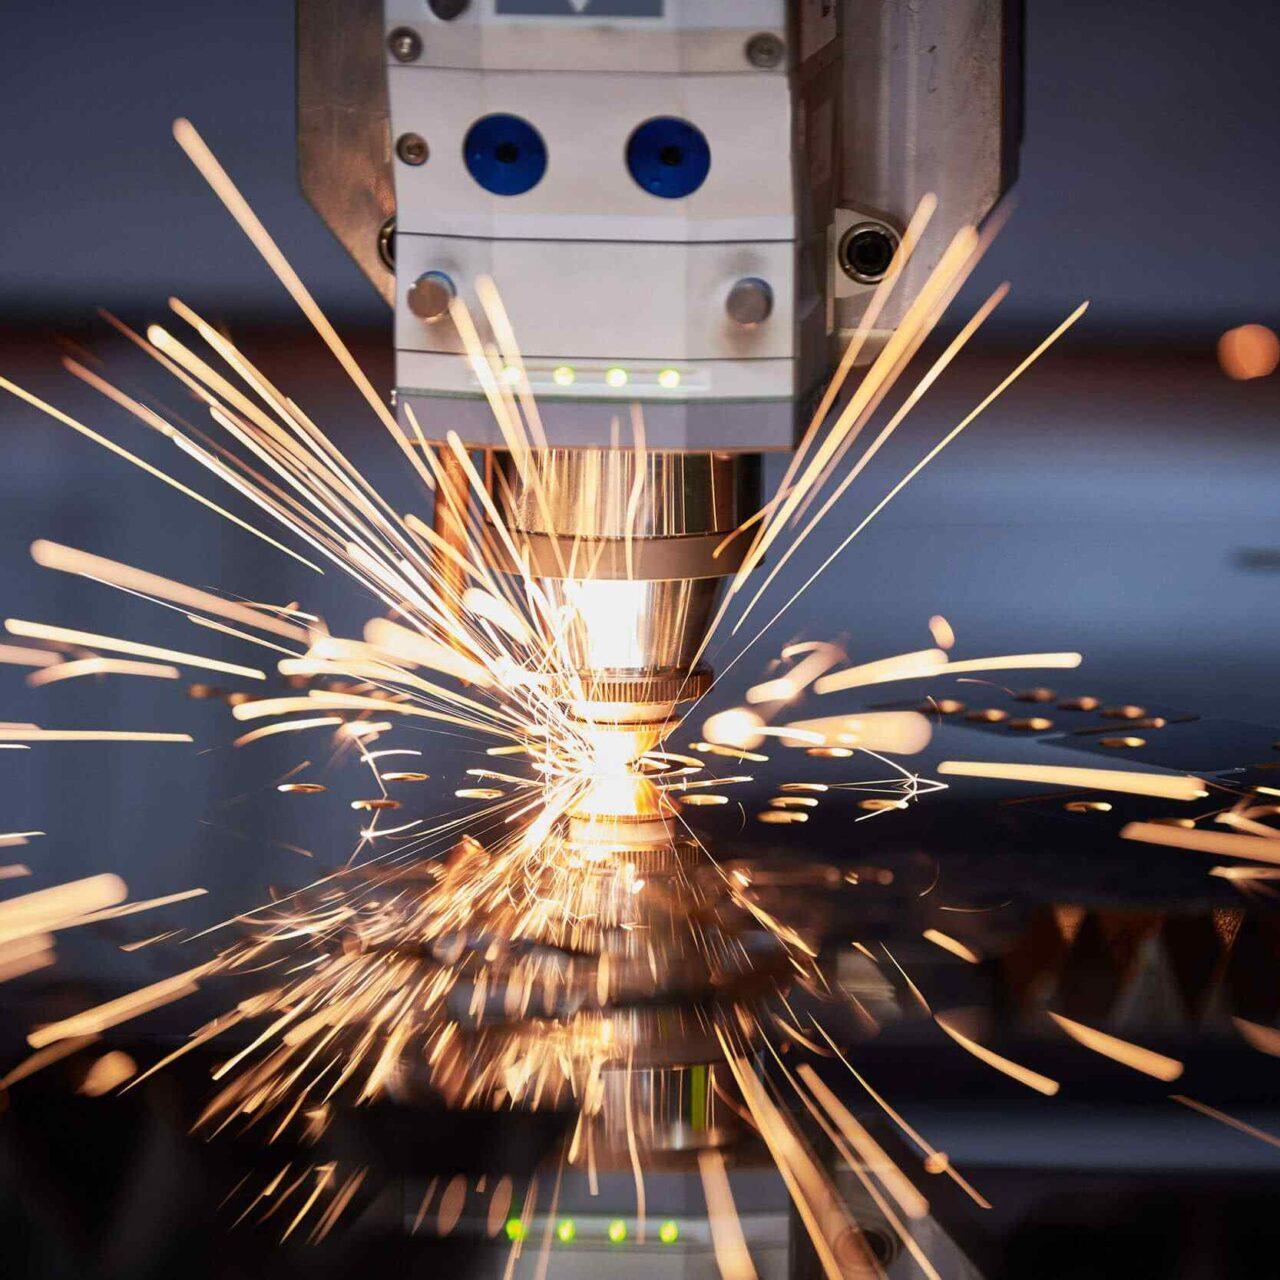 Amwerk named industry leader